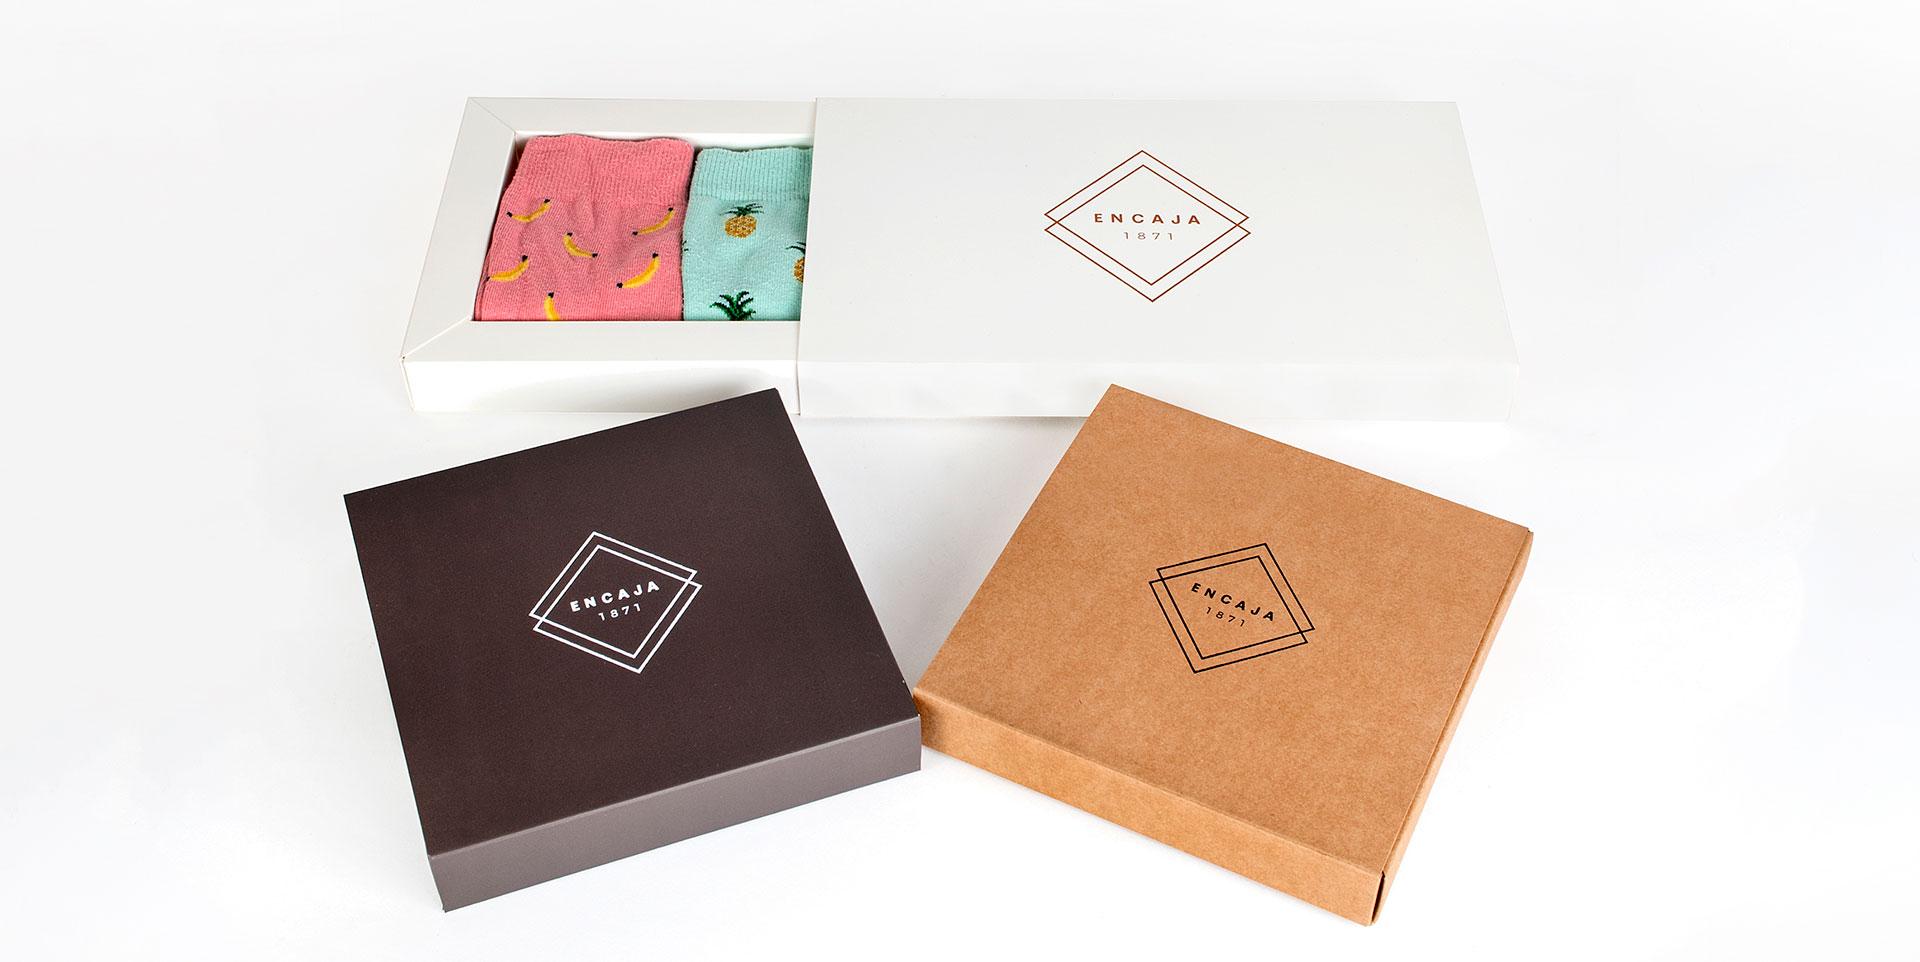 encaja-cajas-a-medida-forradas-pequena-cantidades-packaging-360-3.jpg